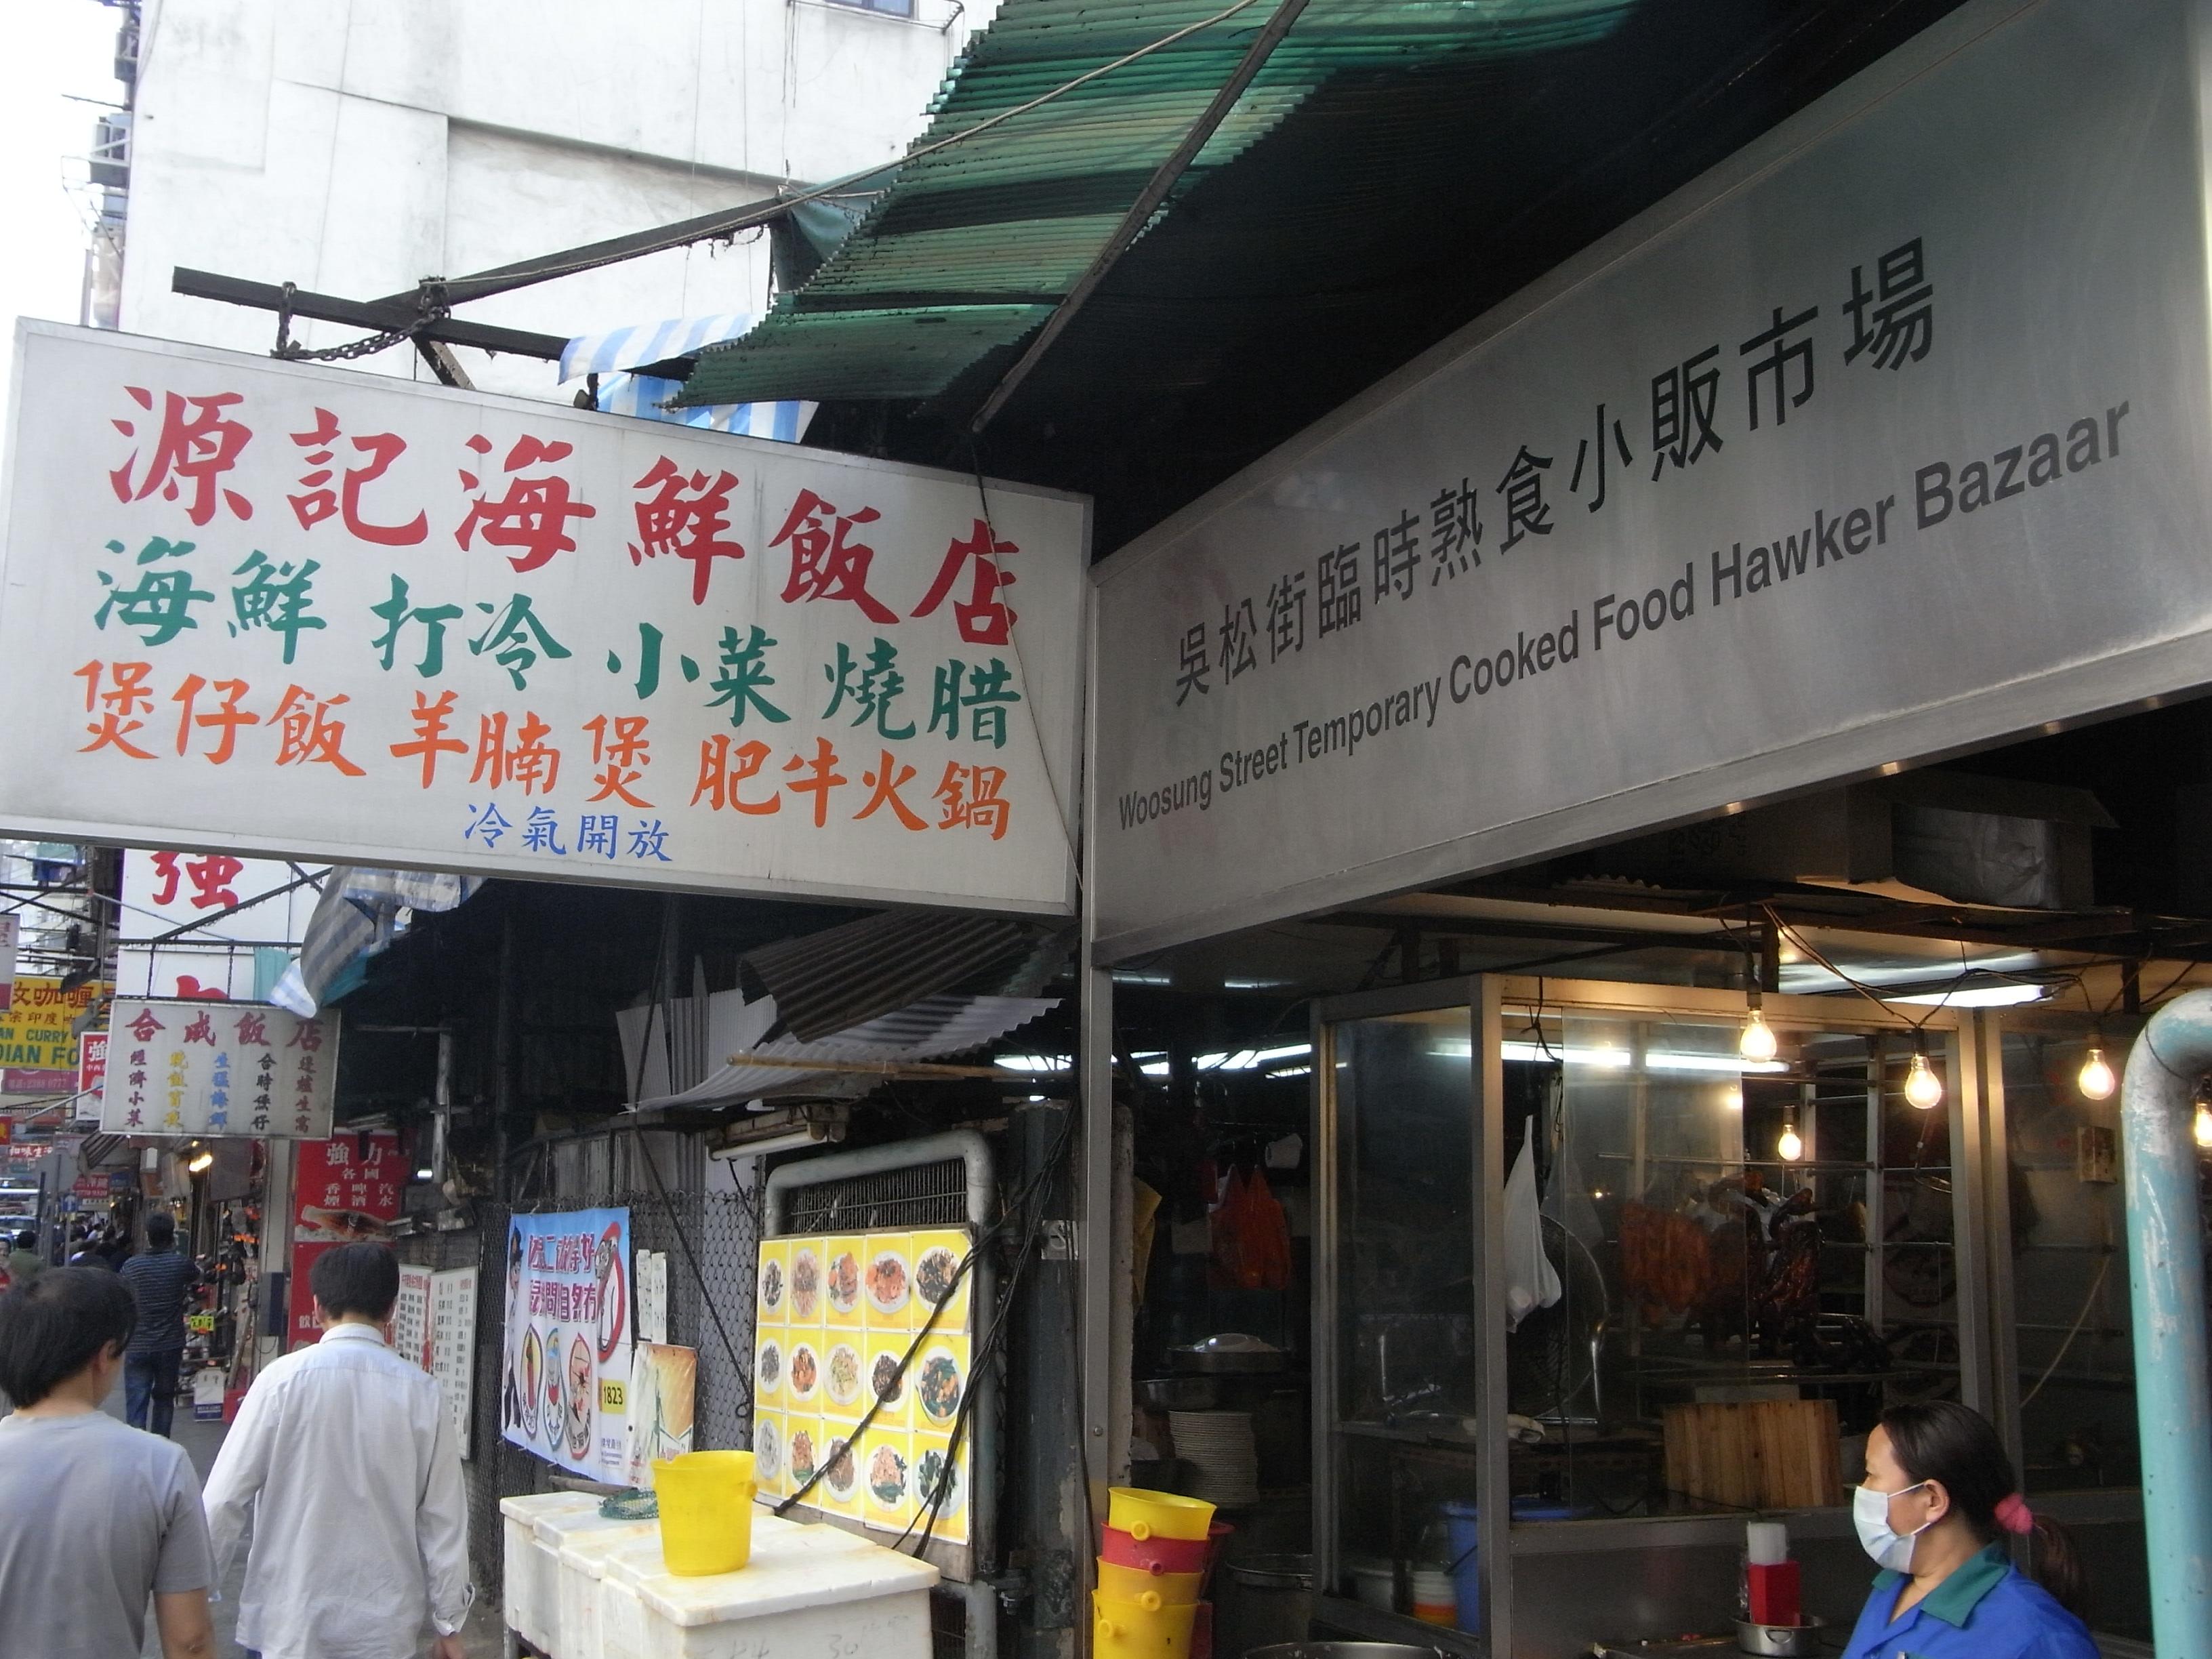 File:HK Jordan 吳松街臨時熟食小販市場 Woosung Street